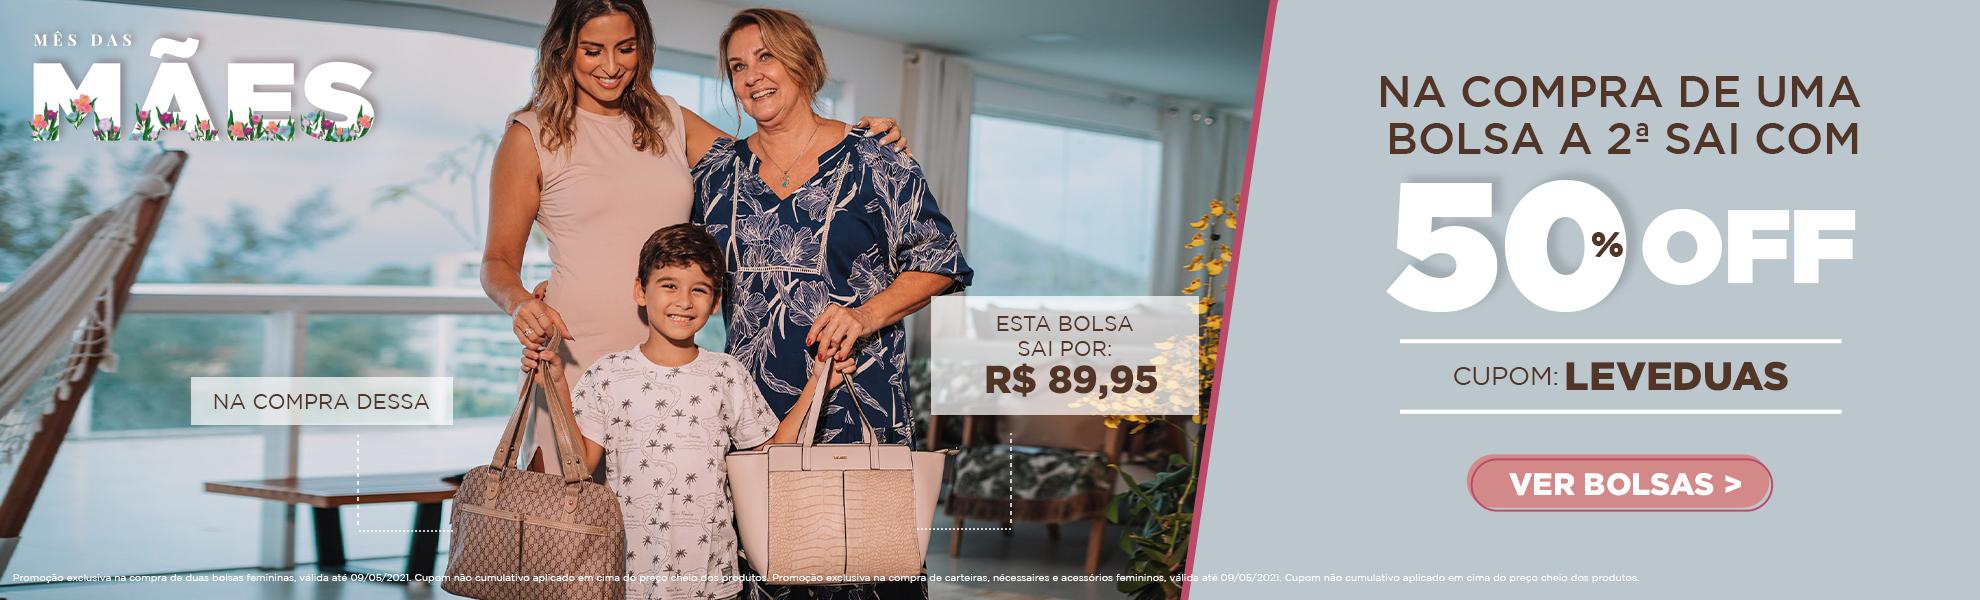 MÃES - 50% OFF NA 2A BOLSA